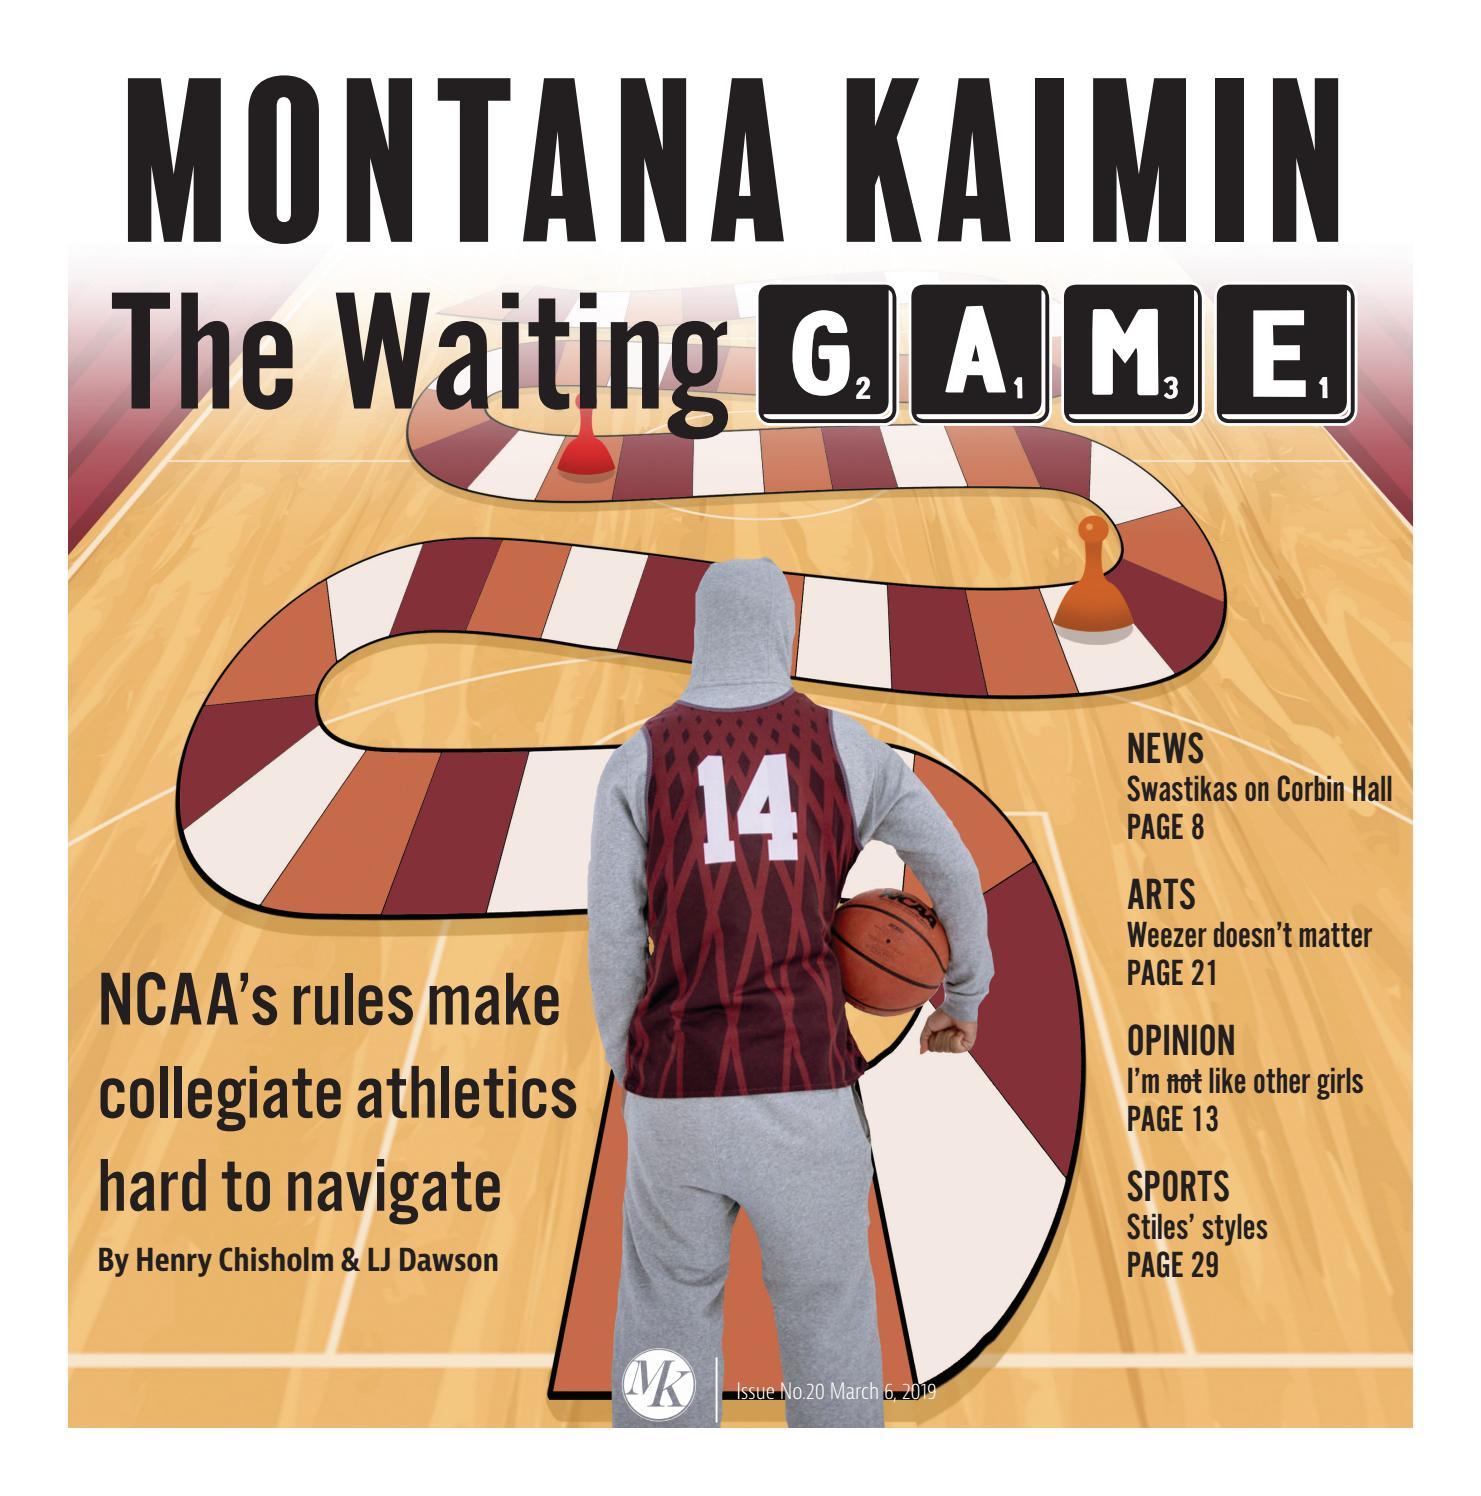 Montana Kaimin March 6 Issue No  20 by Montana Kaimin - issuu